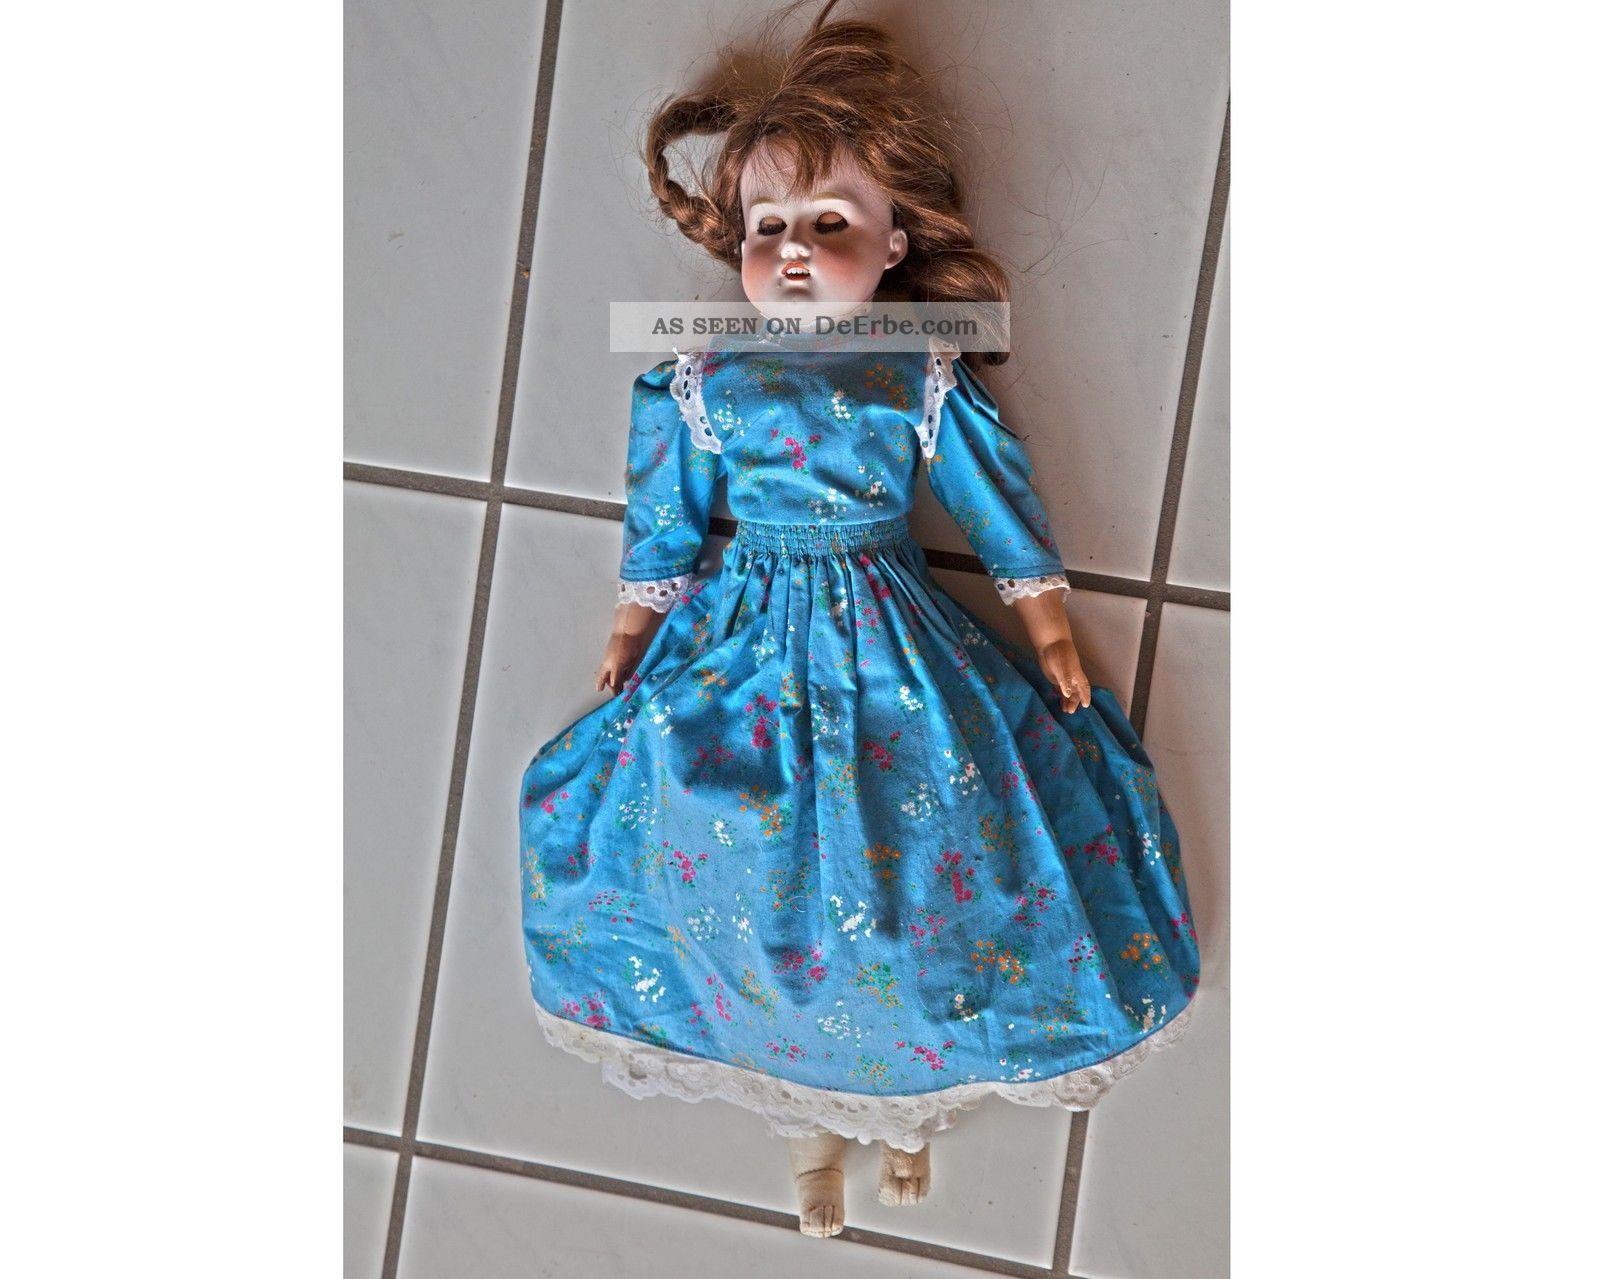 Puppe Armand Marseille 370 Porzellankopf Porzellankopfpuppen Bild